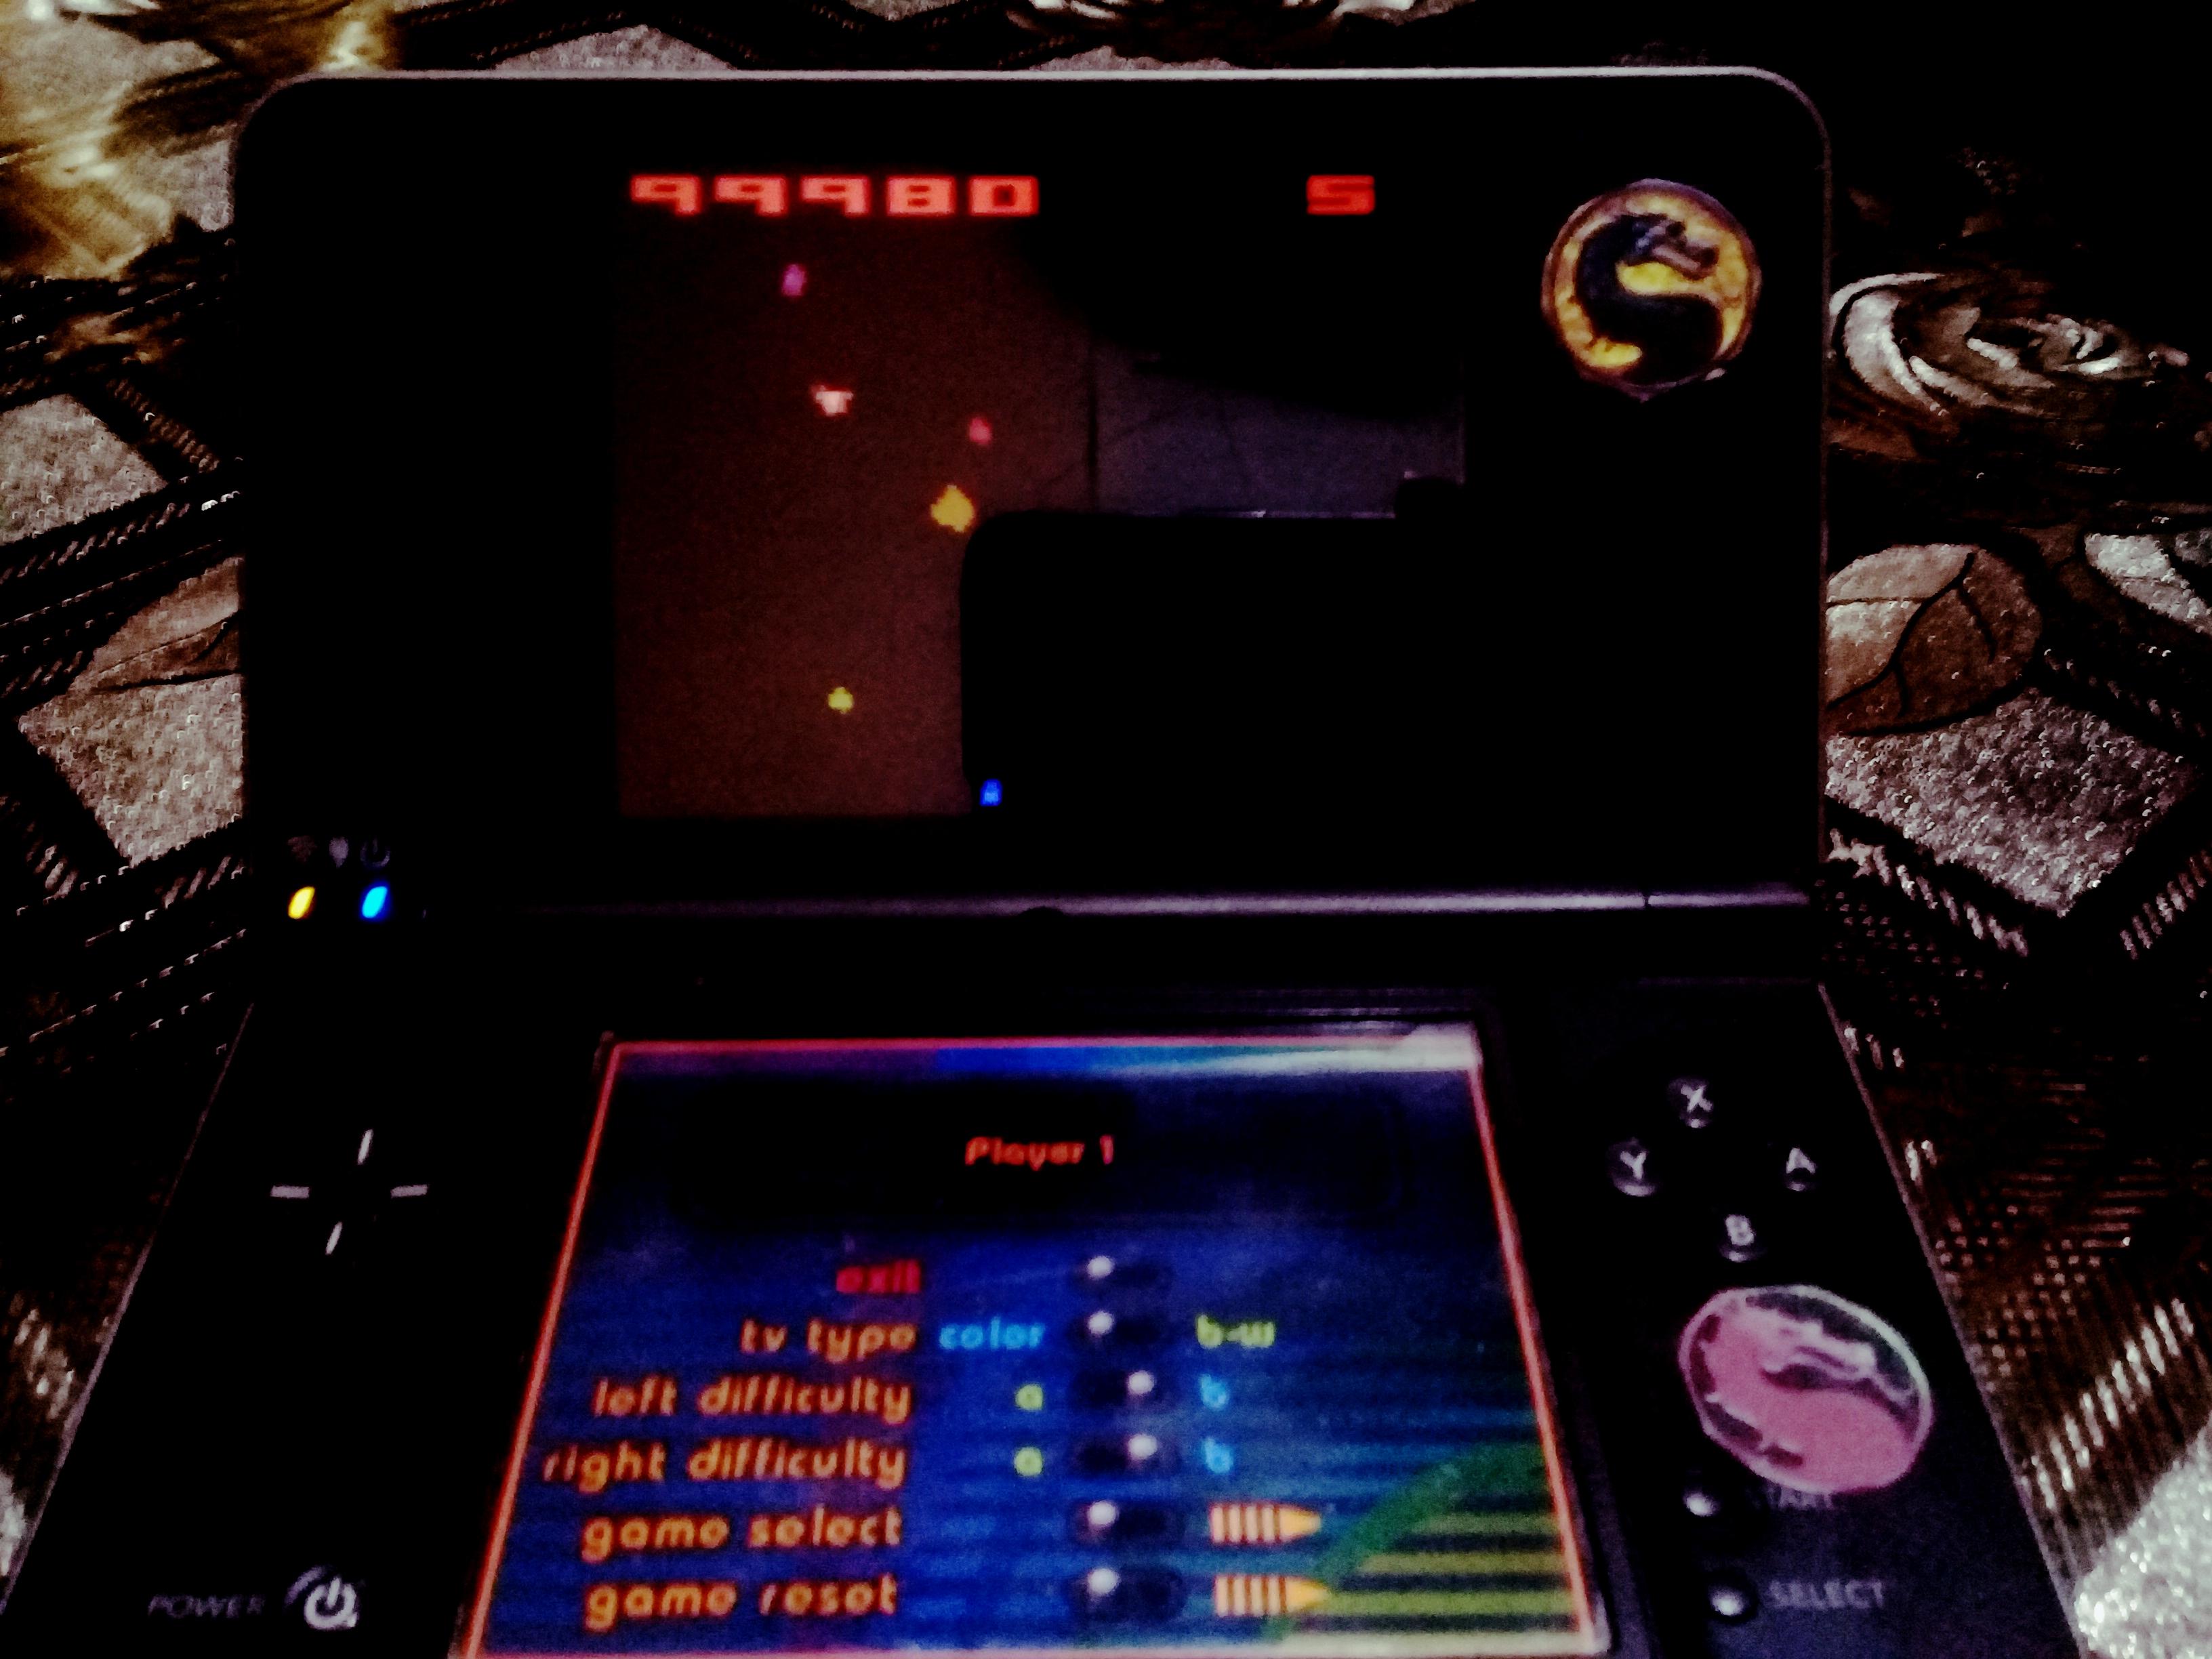 omargeddon: Atari Greatest Hits: Volume 1: Asteroids: Game 1 [Atari 2600] (Nintendo DS) 99,980 points on 2020-10-20 15:27:20